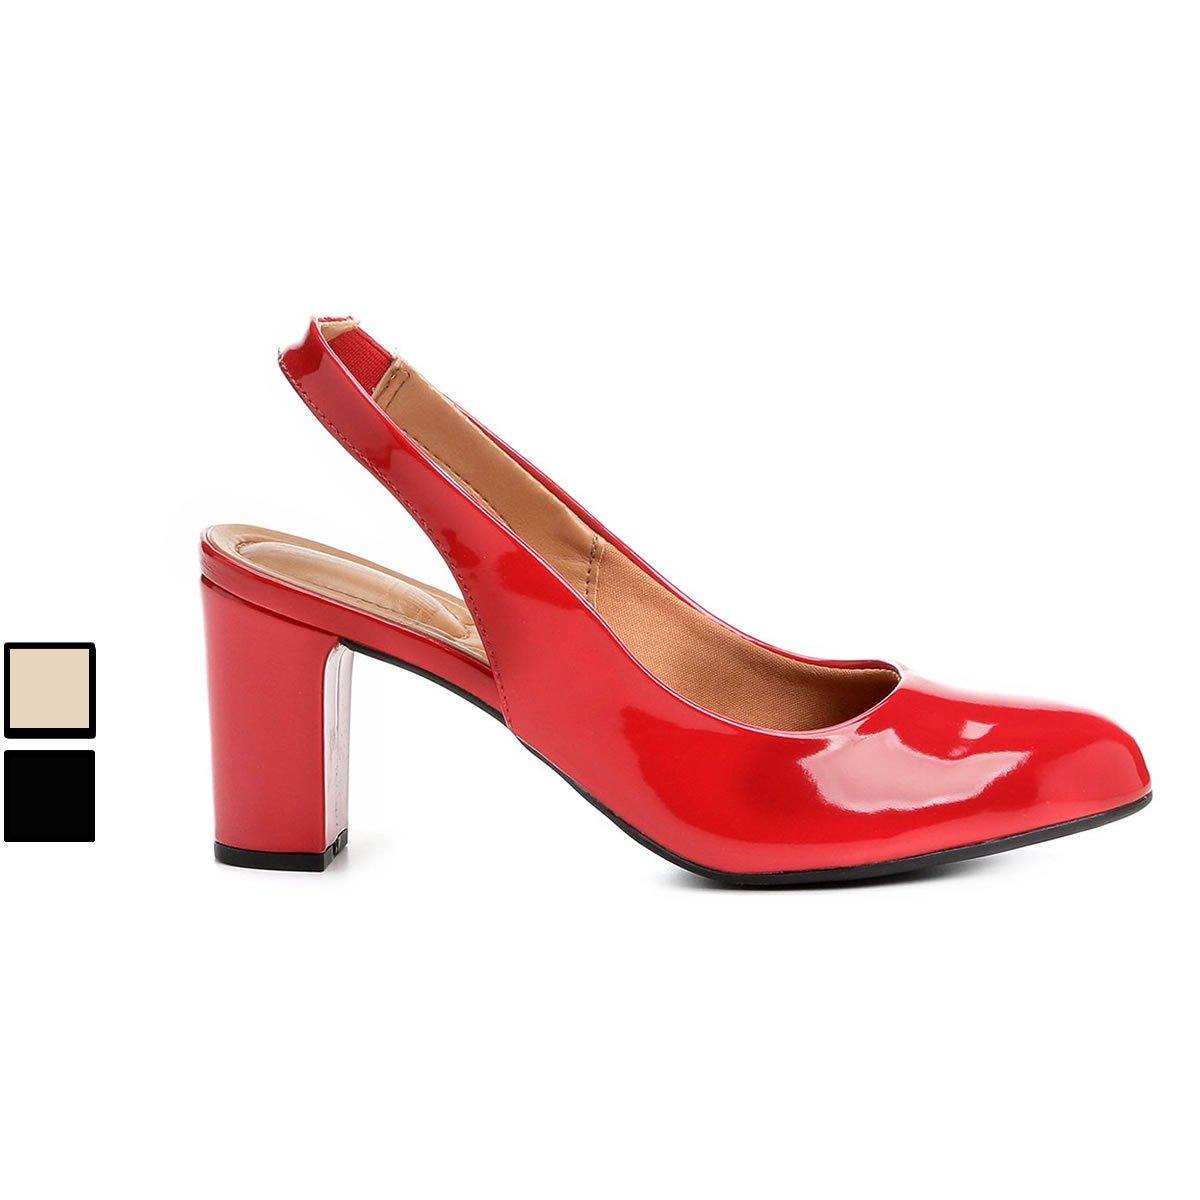 6996b17c84 Scarpin Vizzano Salto Médio Chanel Bico Redondo